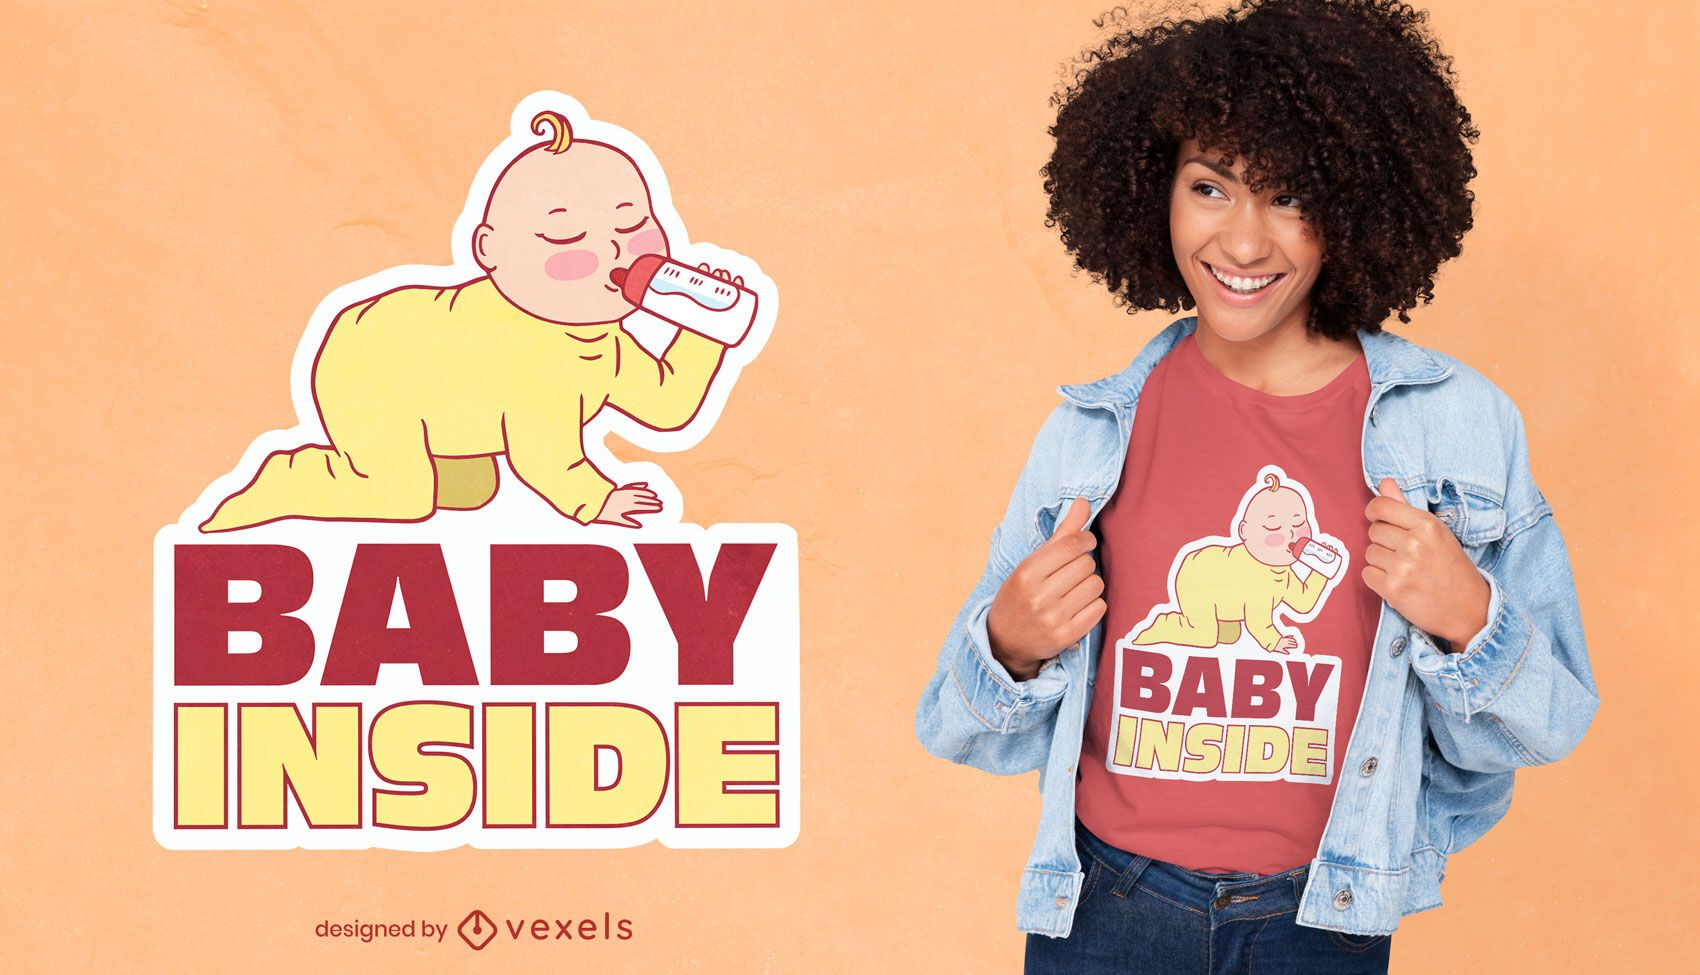 Bebê dentro do design da camiseta da gravidez